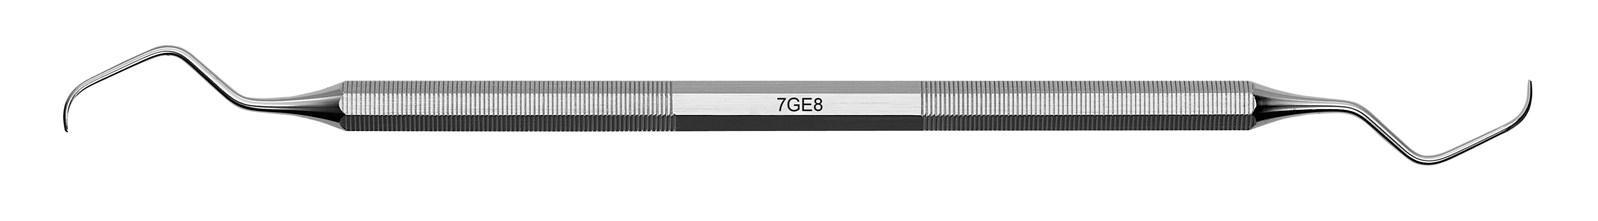 Kyreta Gracey Classic - 7GE8, Bez návleku